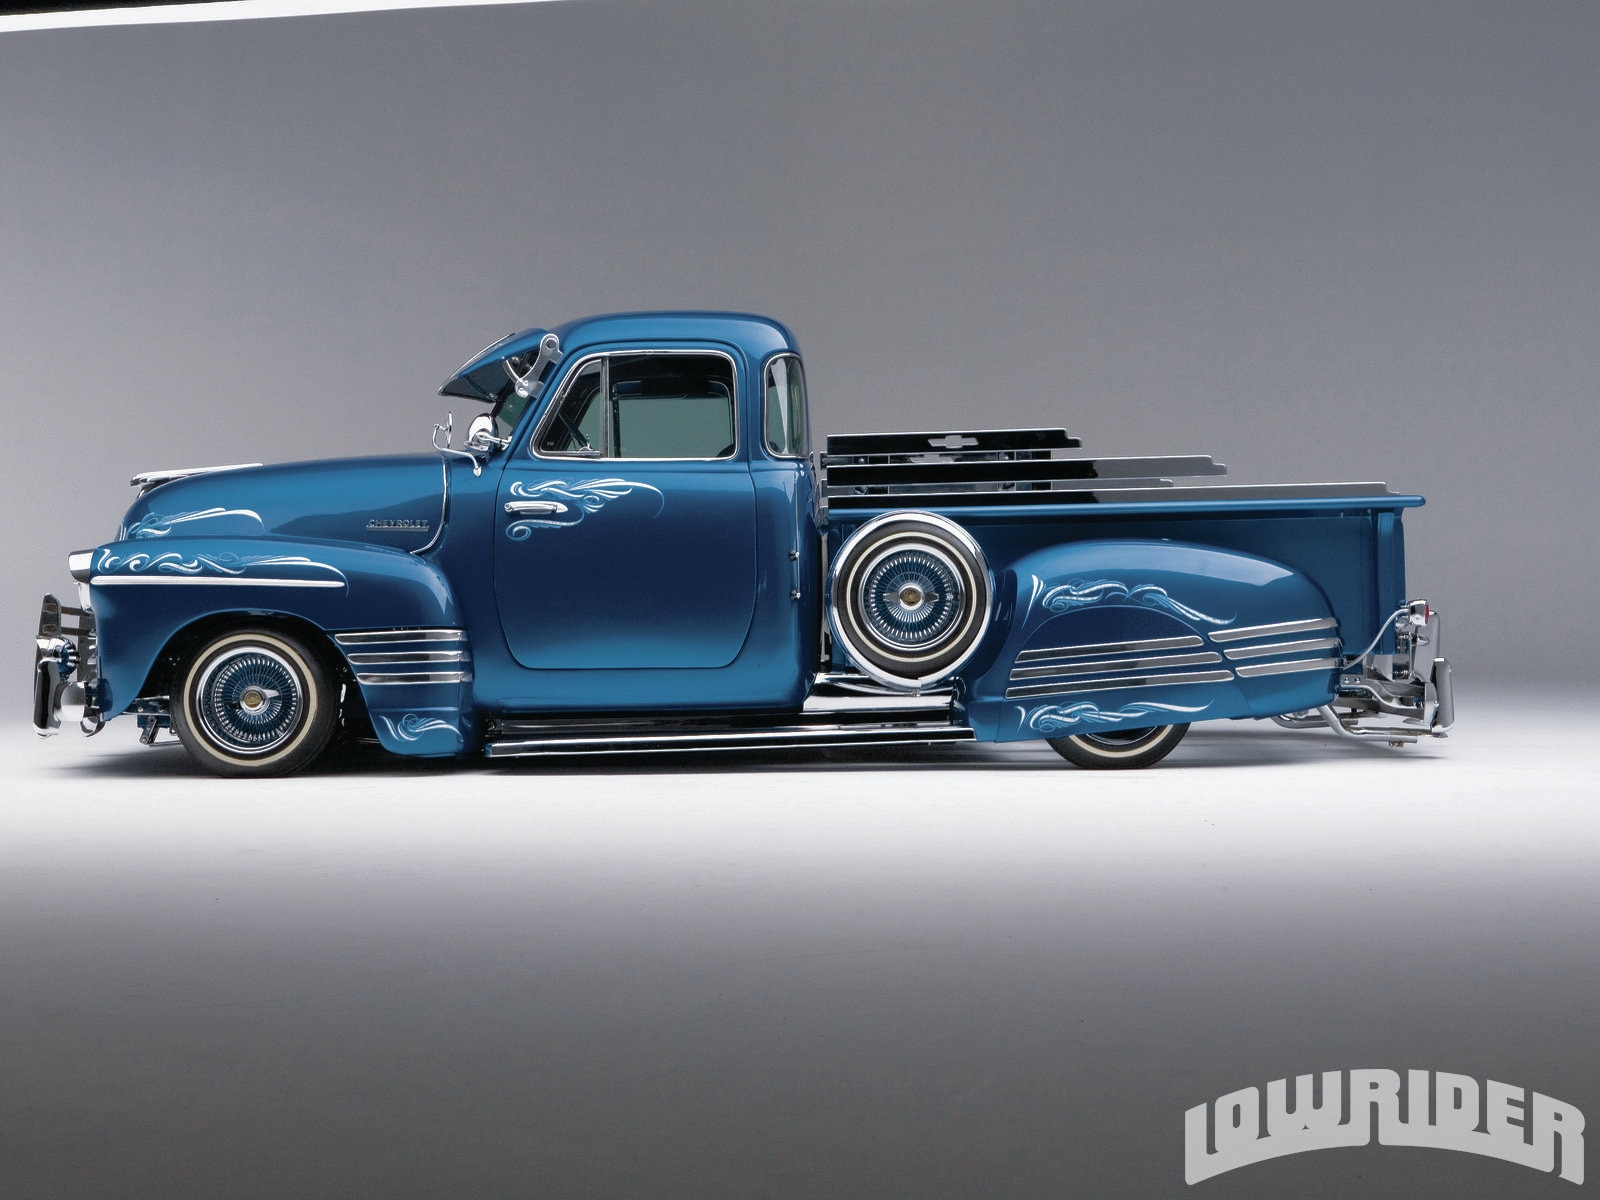 1951 Chevrolet Truck Lowrider Magazine